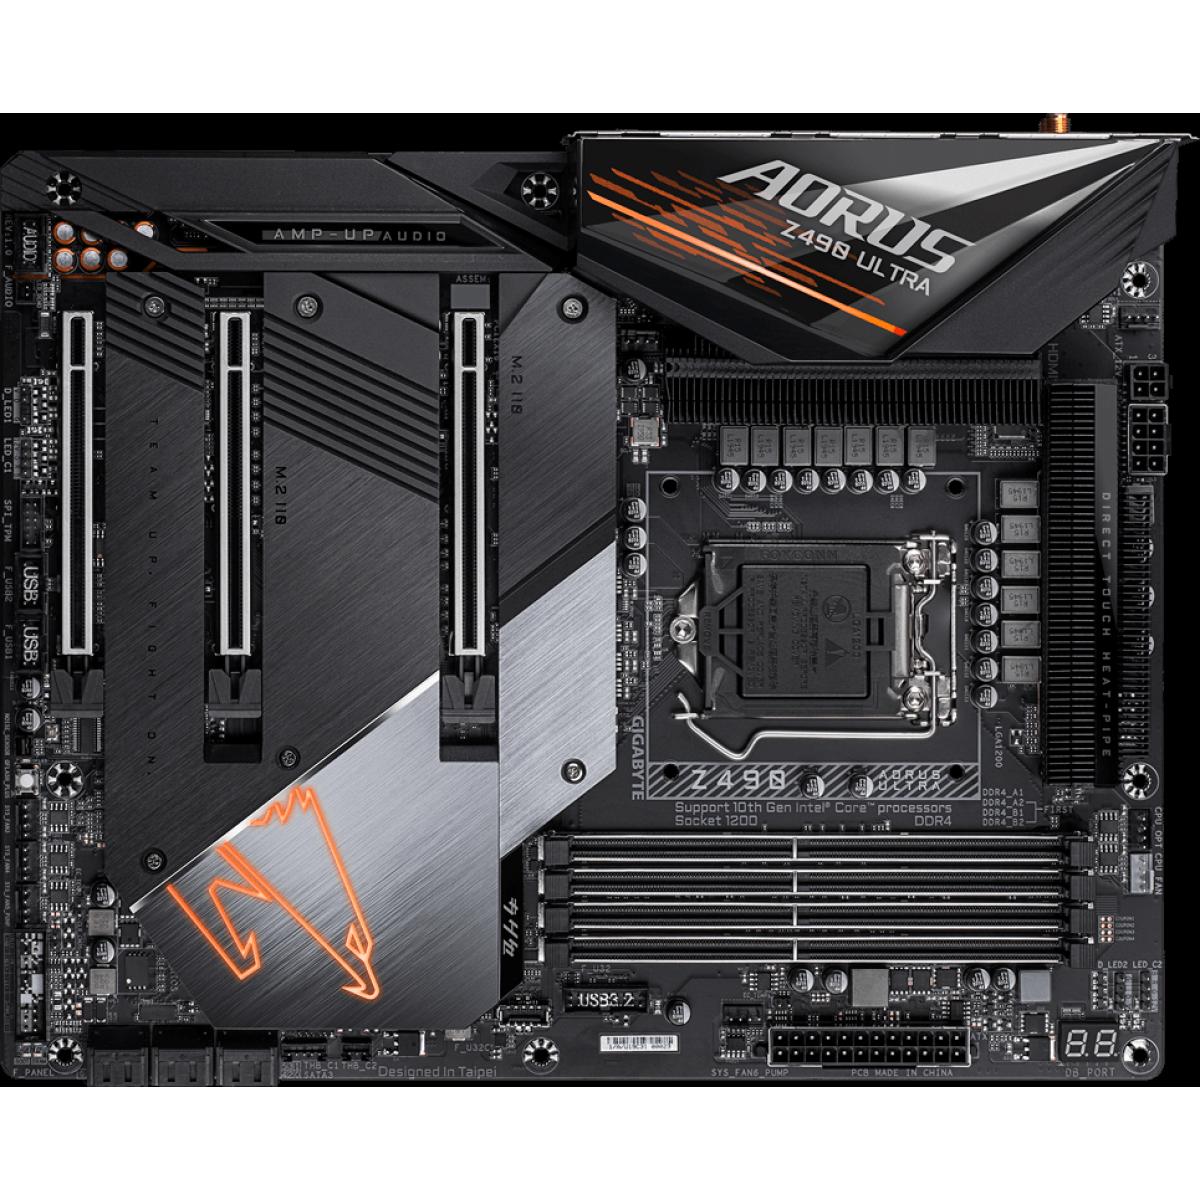 Placa Mãe Gigabyte Z490 Aorus Ultra 1.1, Chipset Z490, Intel LGA 1200, Wi-Fi, ATX, DDR4